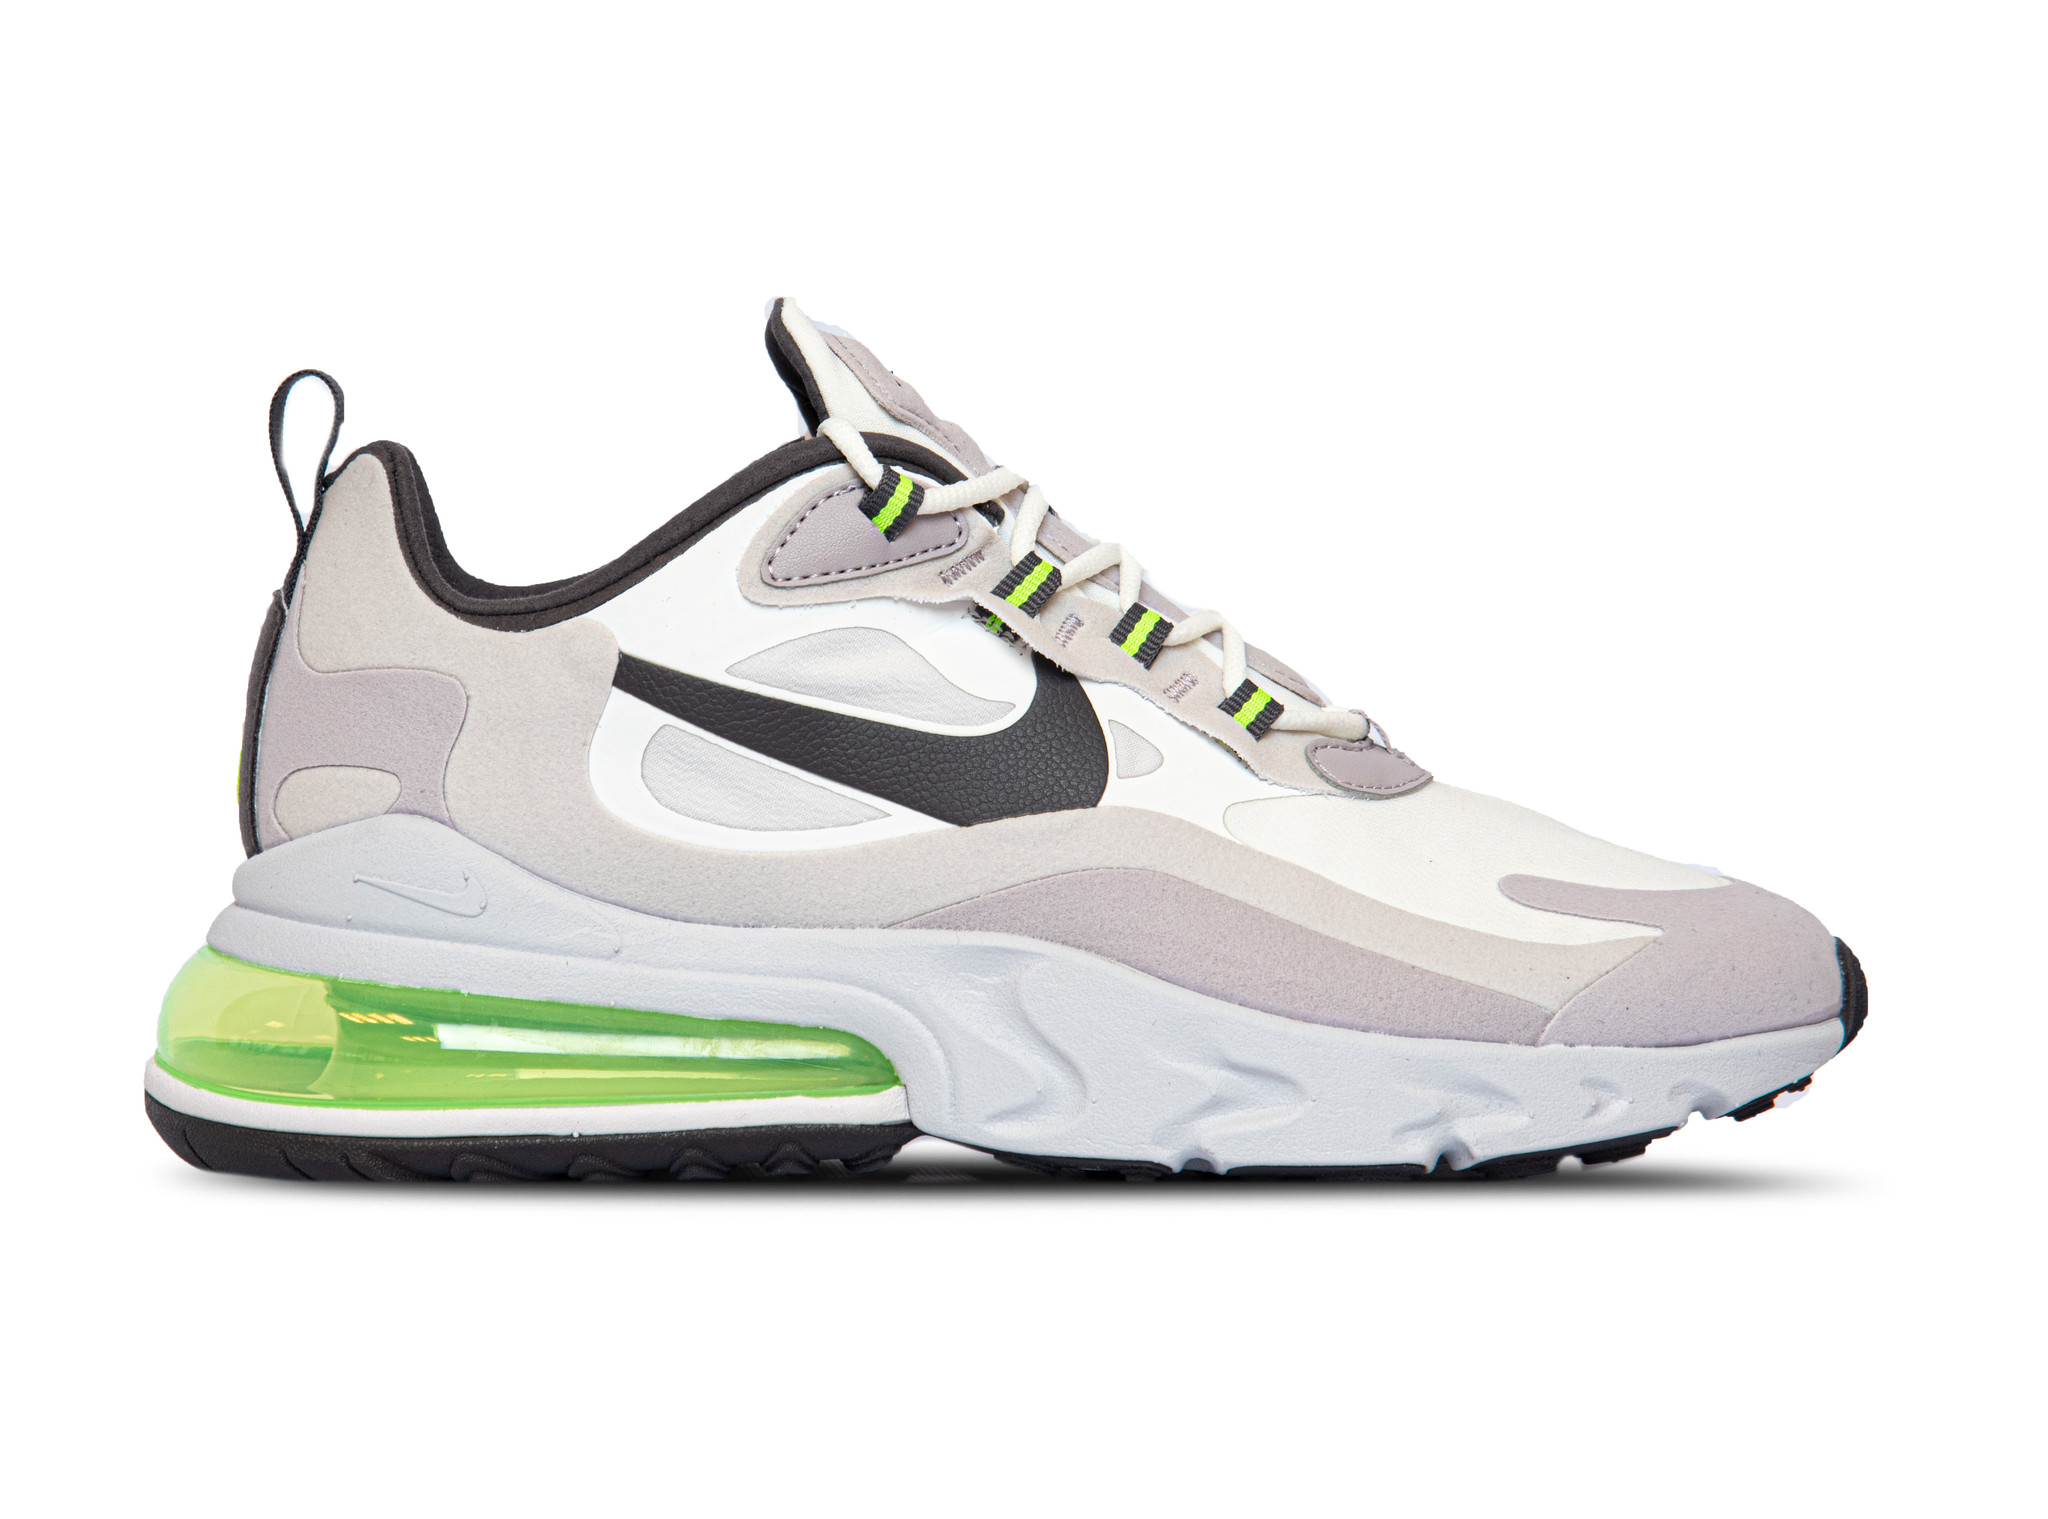 Nike Air Max 270 React Summit White Electric Green Vast Grey CI3866 100 | Bruut Online shop Electric Green Vast Grey CI3866 100 | Bruut Online shop